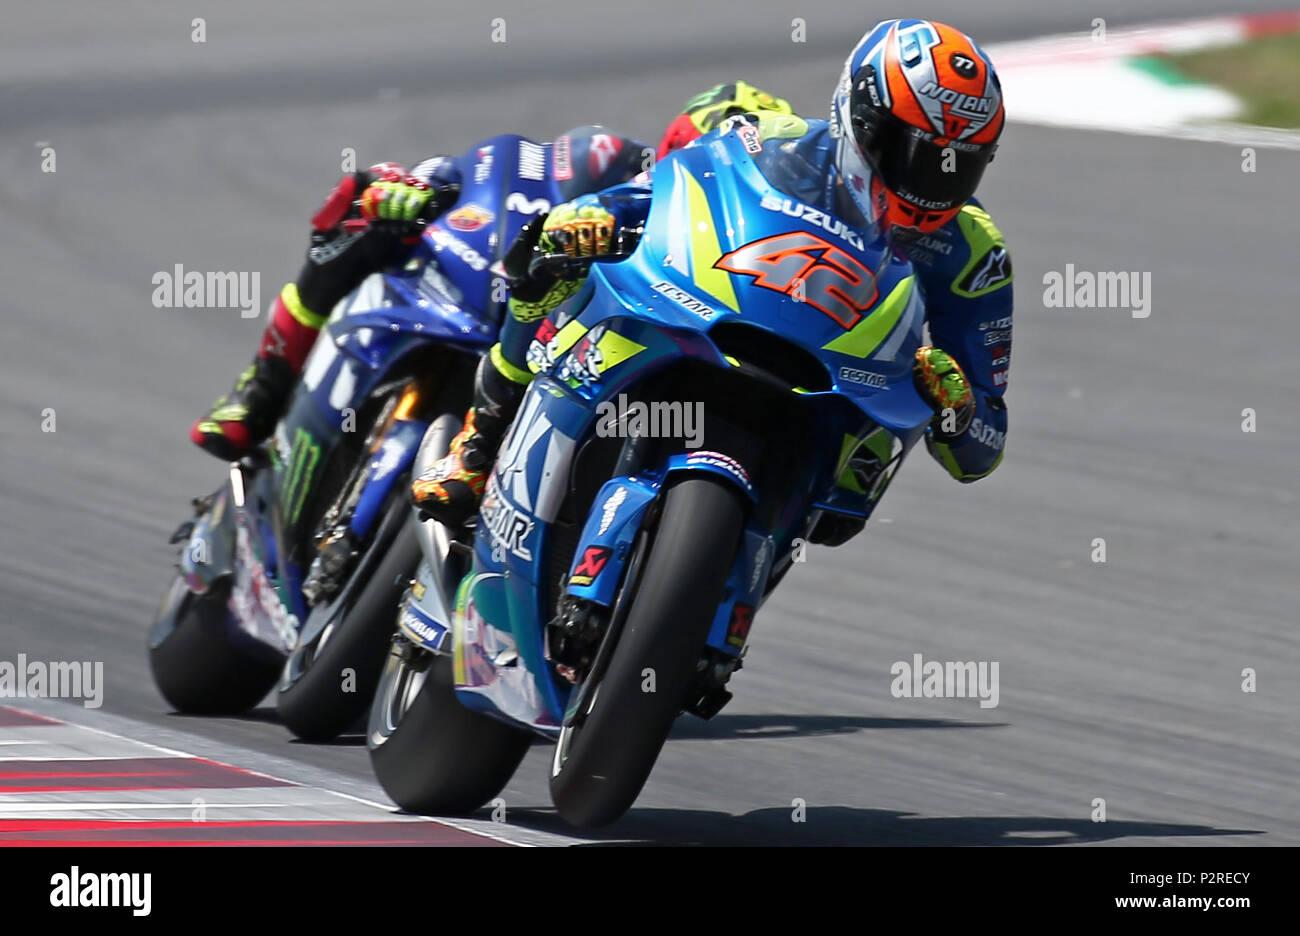 Barcelona -16th June 2018- SPAIN: Alex Rins (Suzuki) during the qualifying of the GP Catalunya Moto GP, in the Barcelona-Catalunya Circuit, on 16th June 2018. Photo: Joan Valls/Urbanandsport/Cordon Press - Stock Image